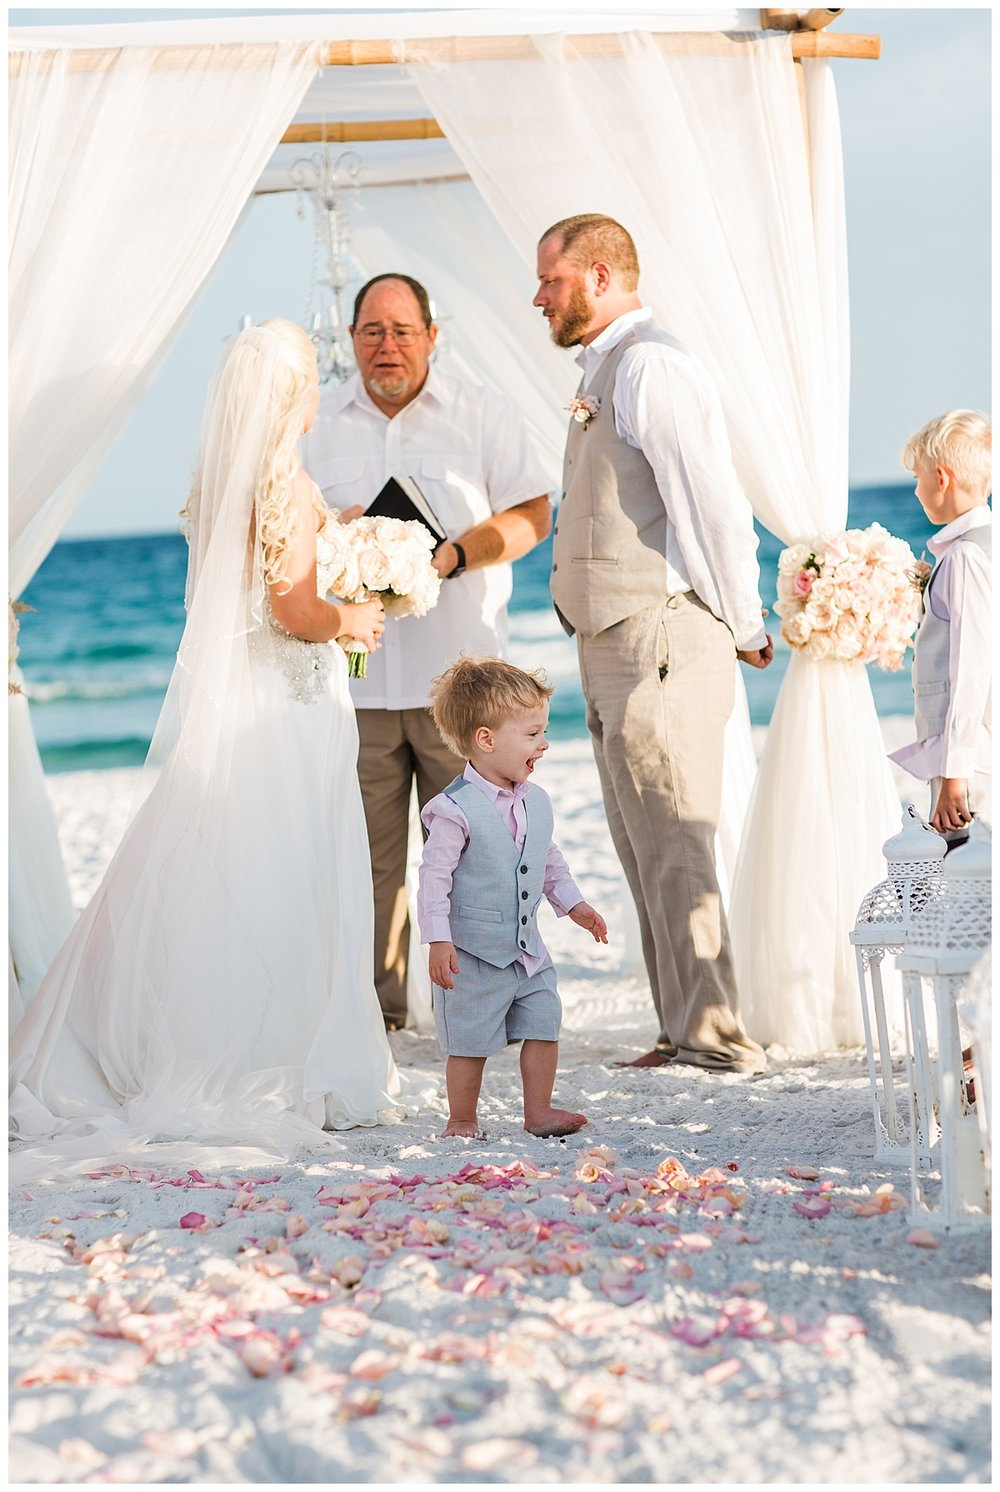 Wedding Arch Rental in Pensacola